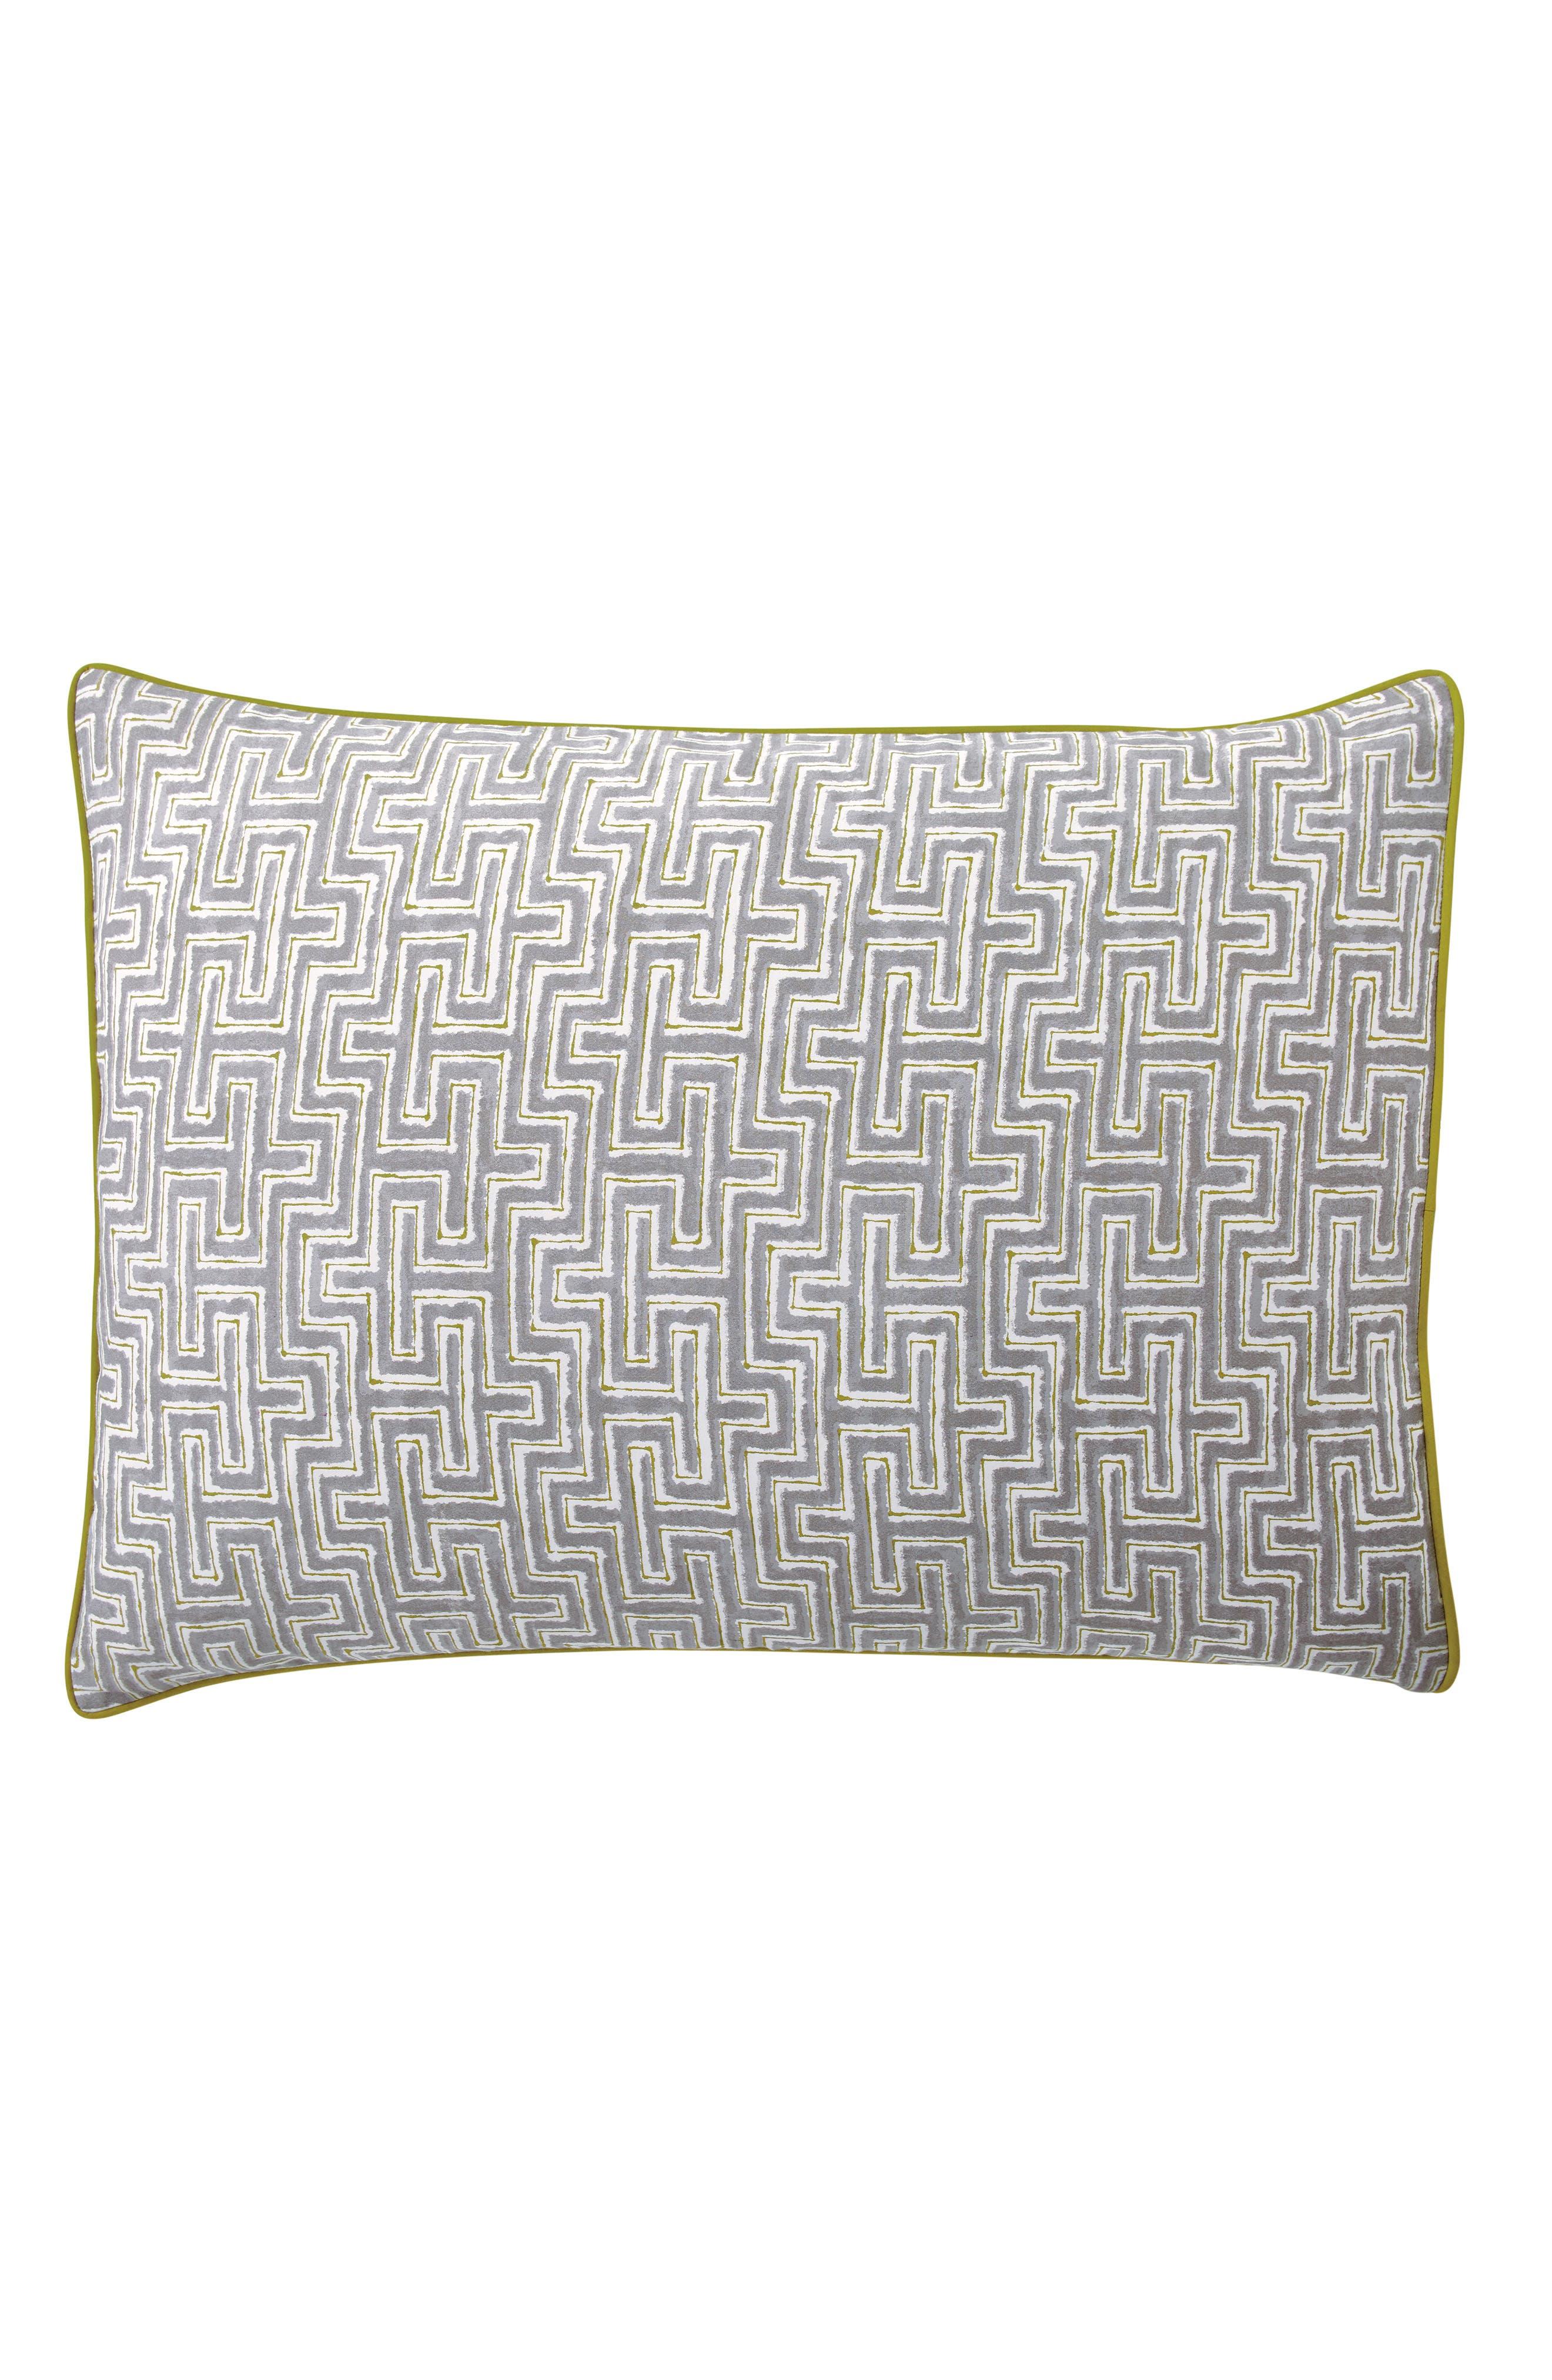 BEDECK,                             Koba Comforter, Sham & Accent Pillow Set,                             Alternate thumbnail 8, color,                             LIGHT GREY